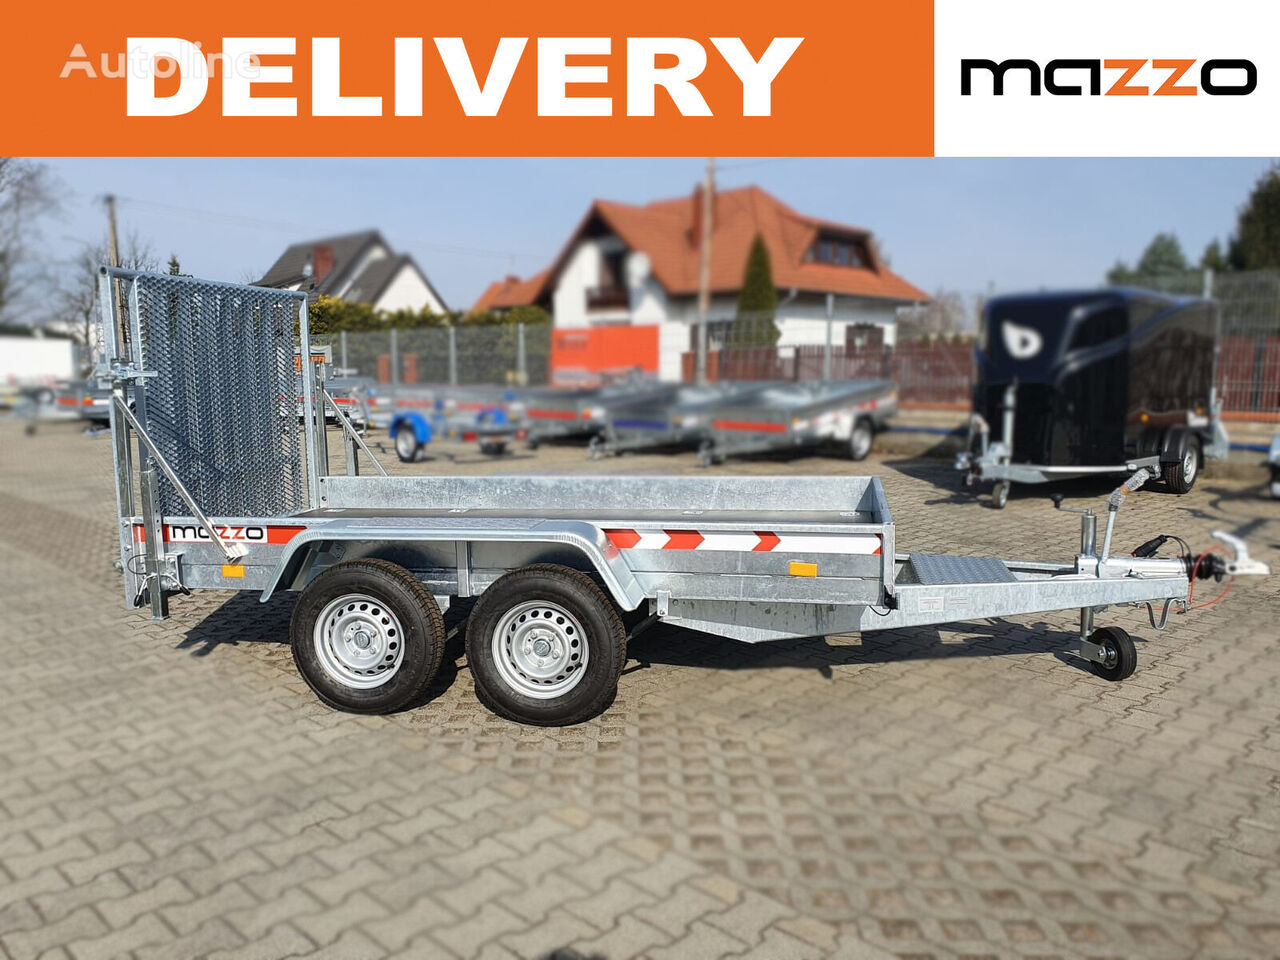 new BAGGERMAX 3.0T for MINI EXCAVATORS equipment trailer